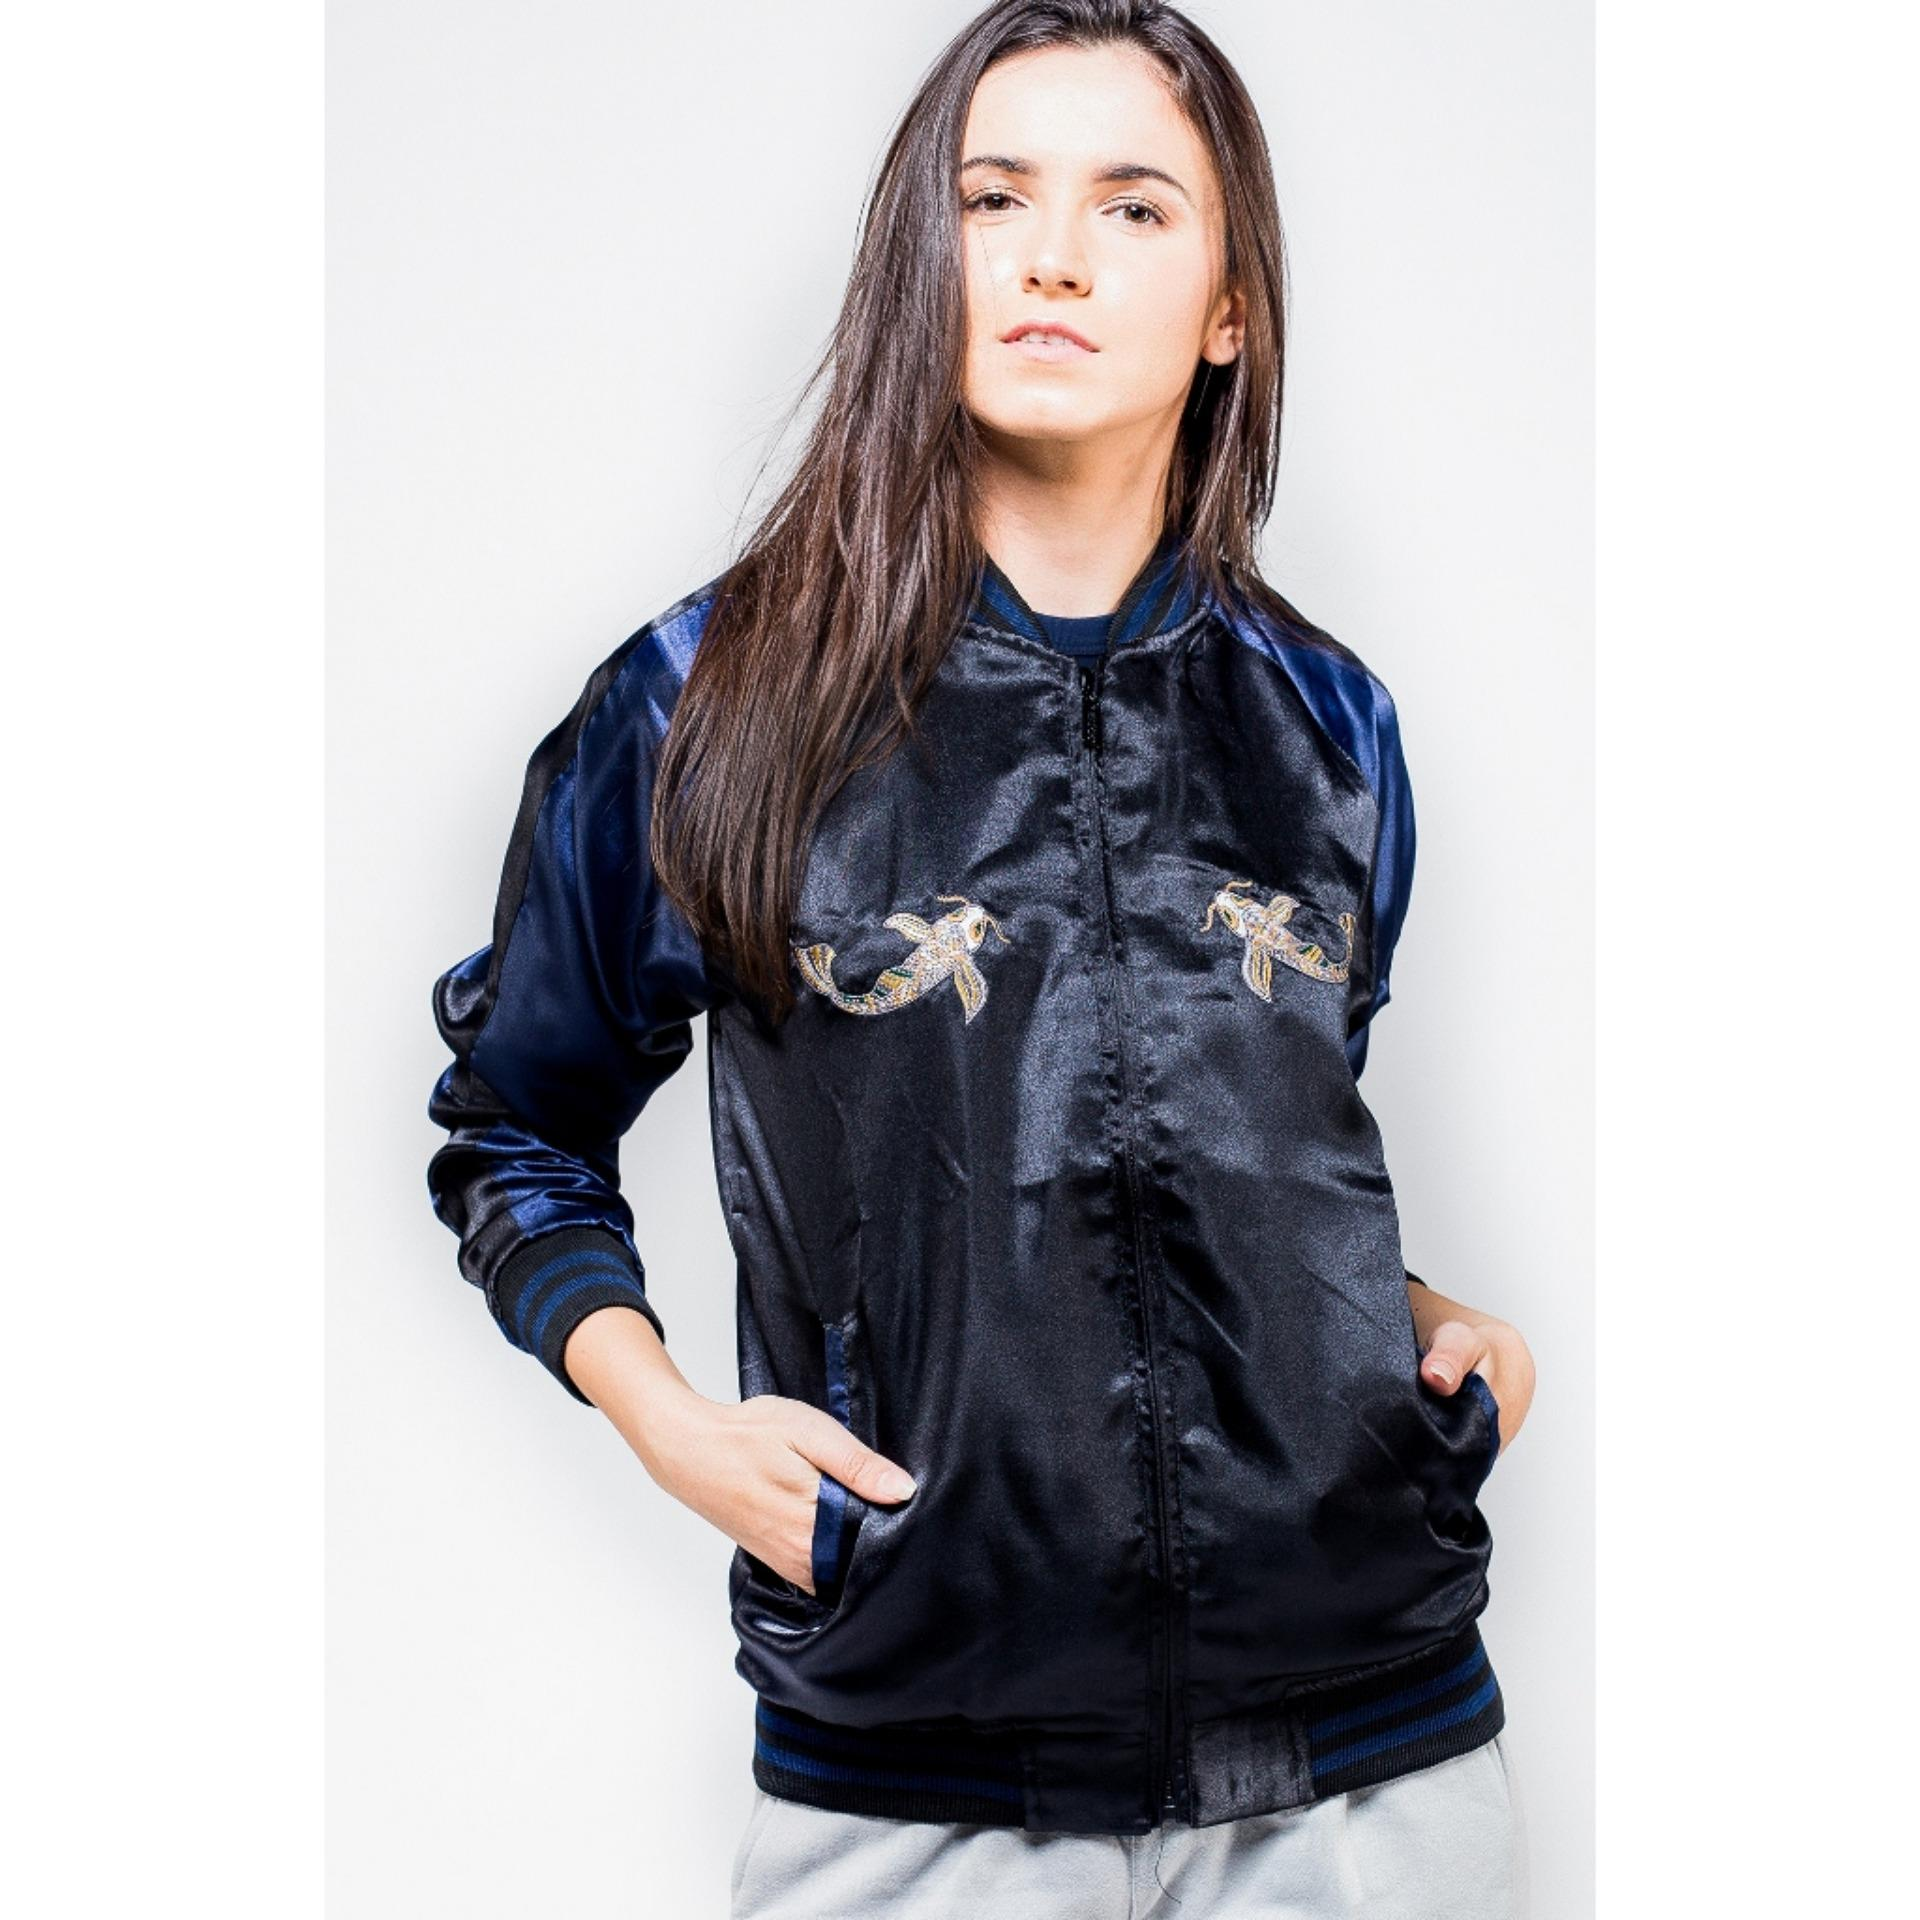 Nusantara Jeans - Celana Jeans Wanita Skinny Ripped Ristleting Erigo ... Source · Pencarian Termurah ERIGO SUKAJAN-DAISUKI NAVY Unisex harga penawaran ...